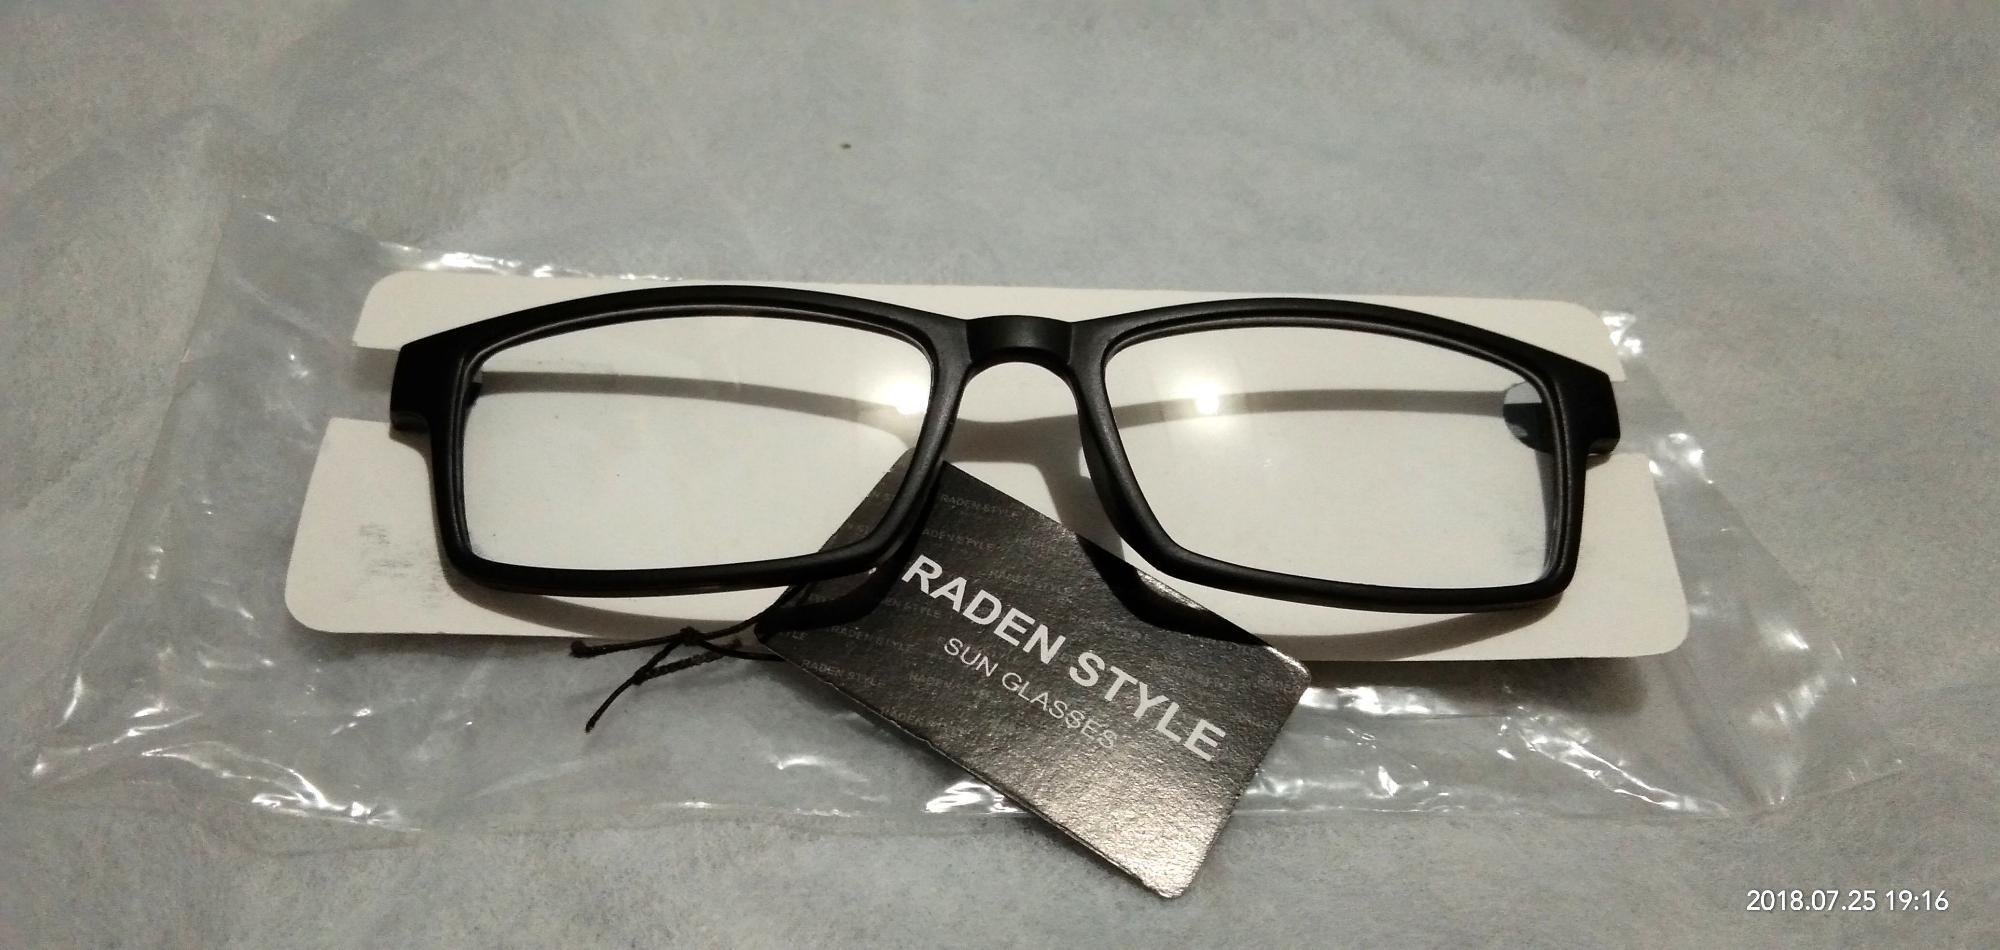 Vintage Style - Kacamata Pria Wanita Unisex - Frame Hitam Doff - Fashion -  INI s Mart ce3b79b356